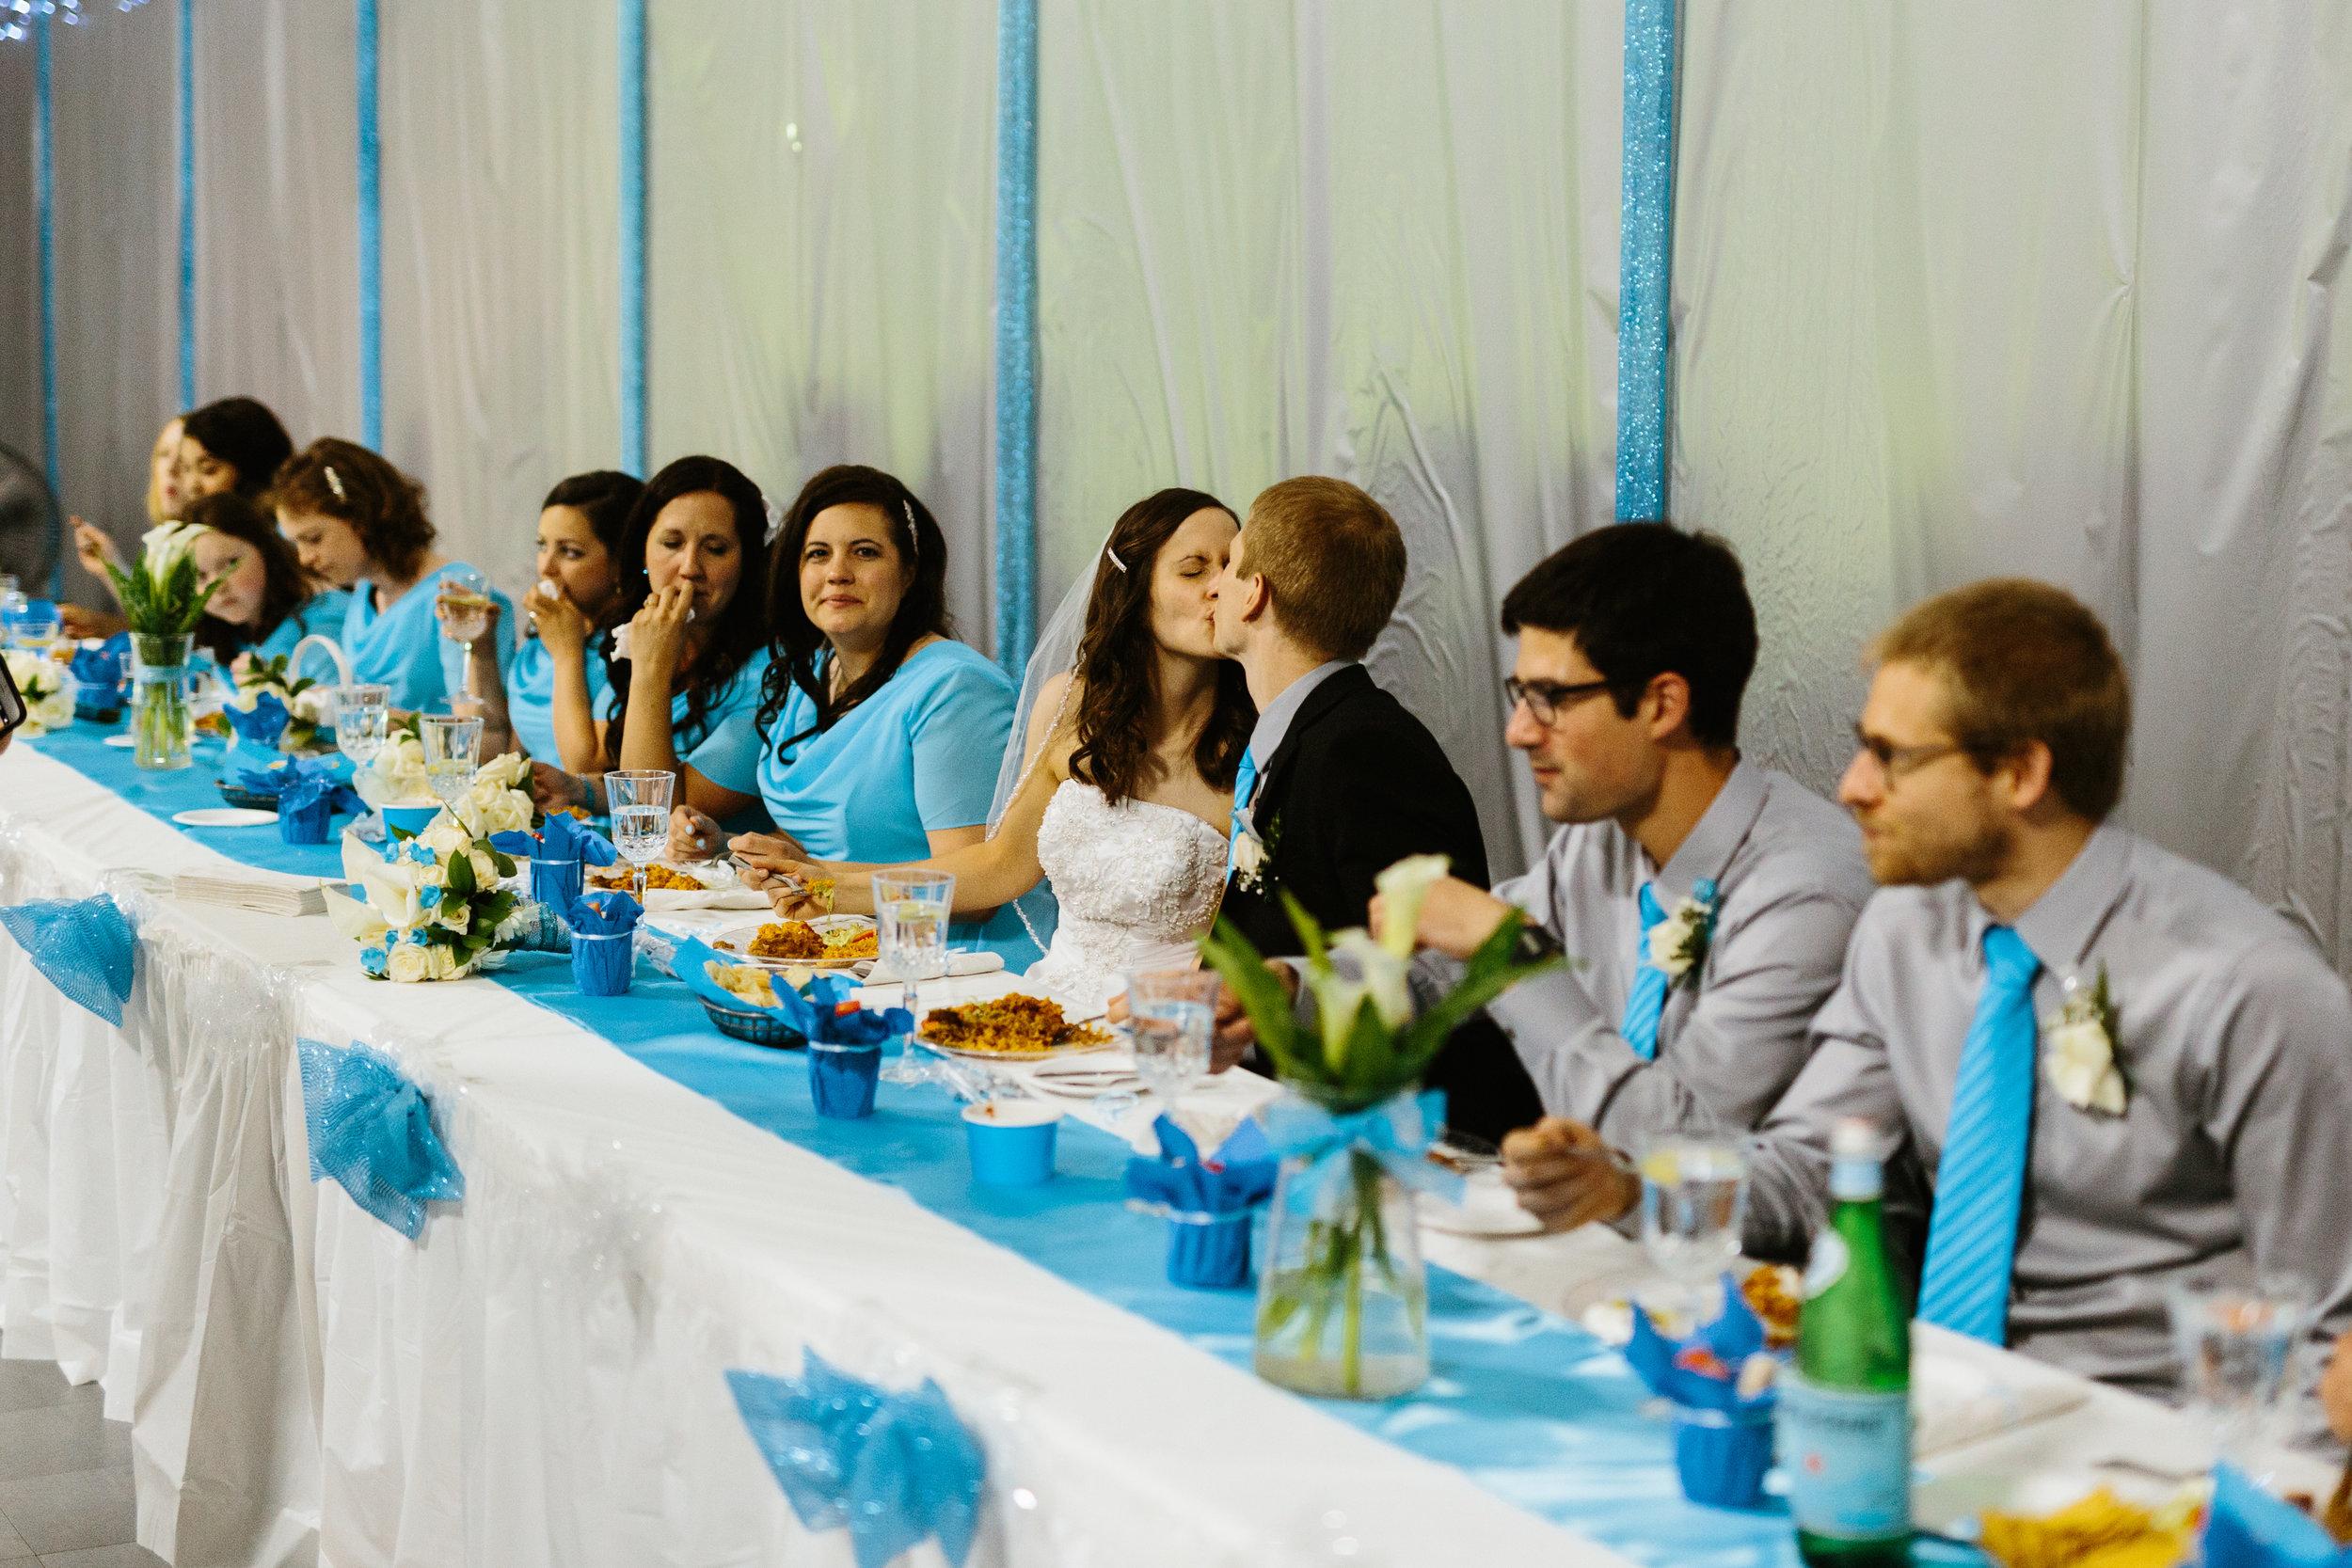 Teller-Payich Wedding-561.jpg